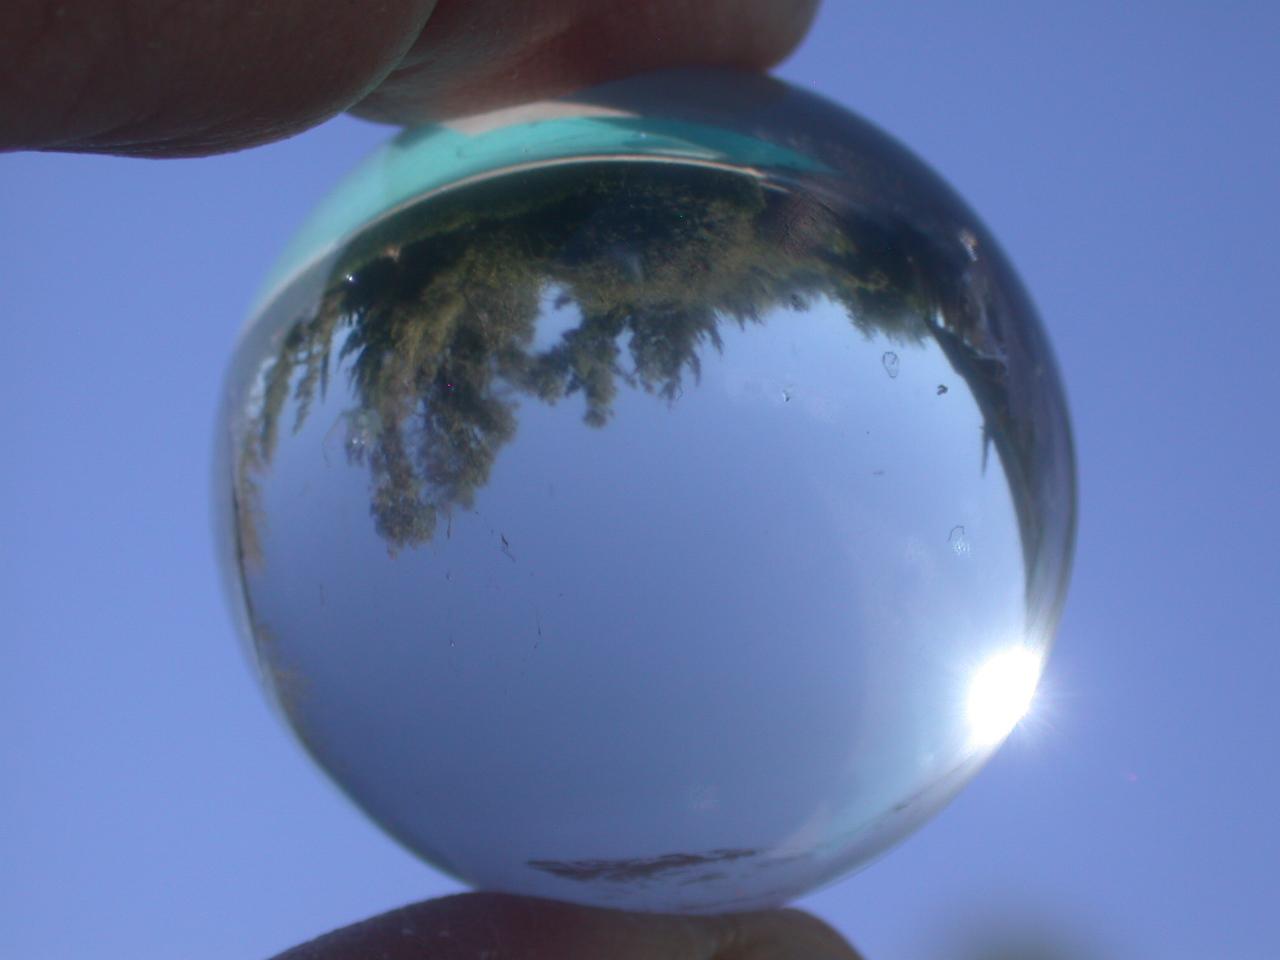 Topaz Sphere Gilgit Beltistan, Pakistan